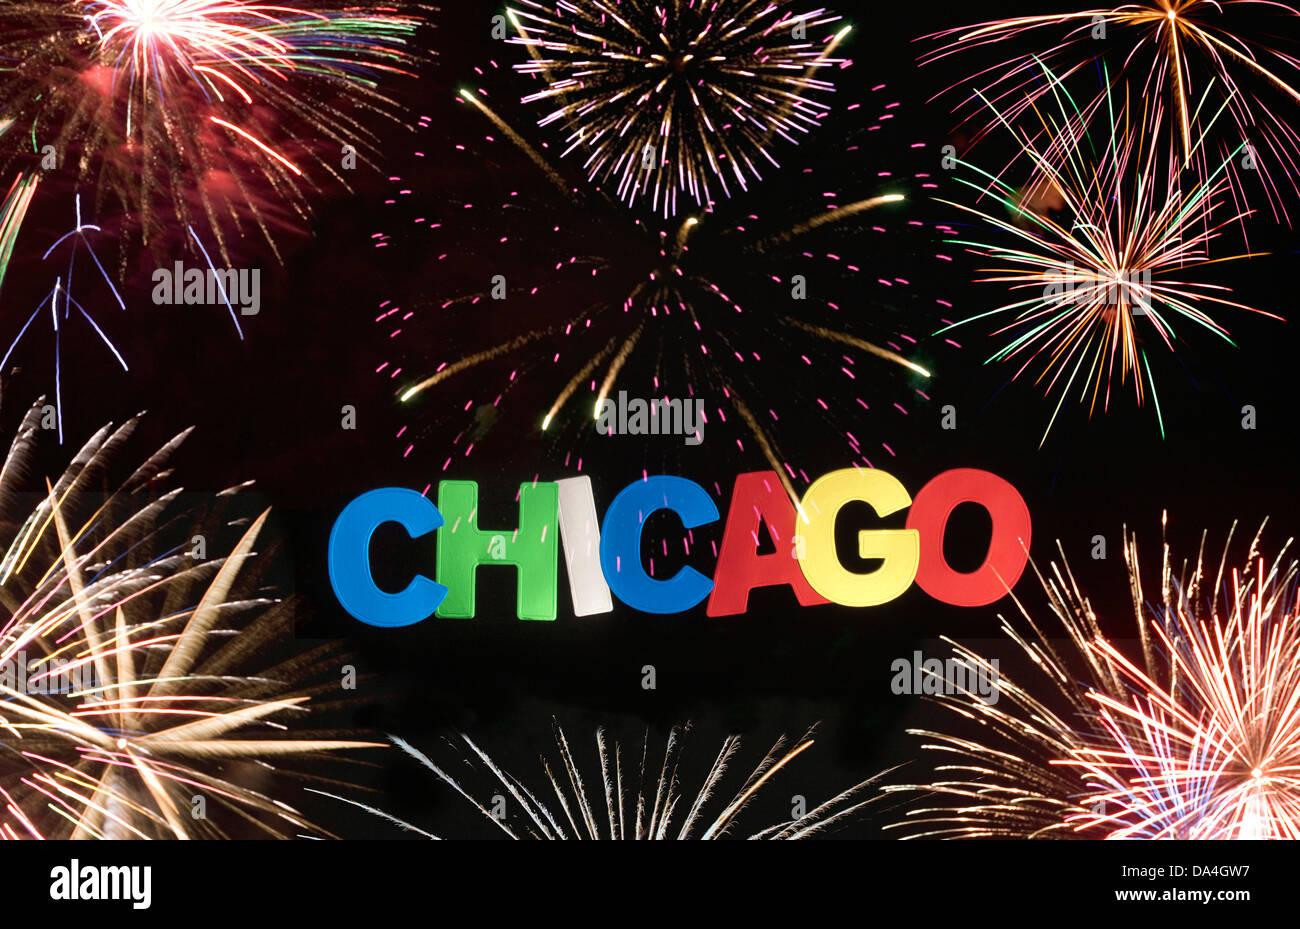 CHICAGO ILLINOIS USA SIGN - Stock Image